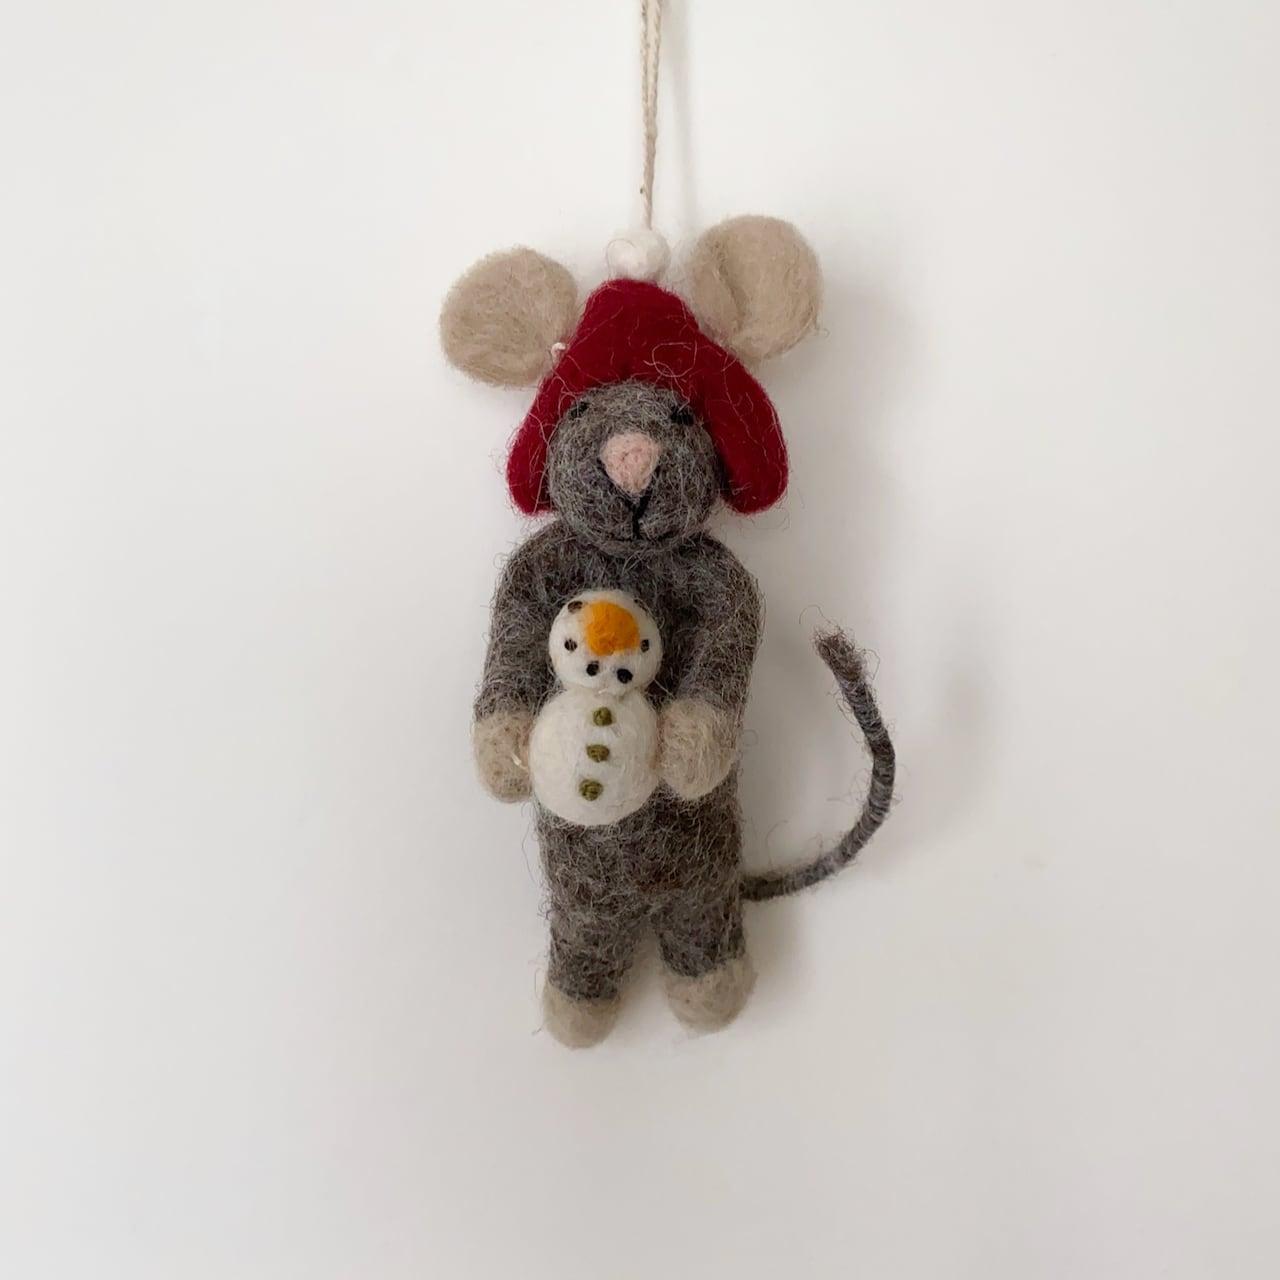 Grey Mouse with Snowman 雪だるまと灰色のマウス オーナメント